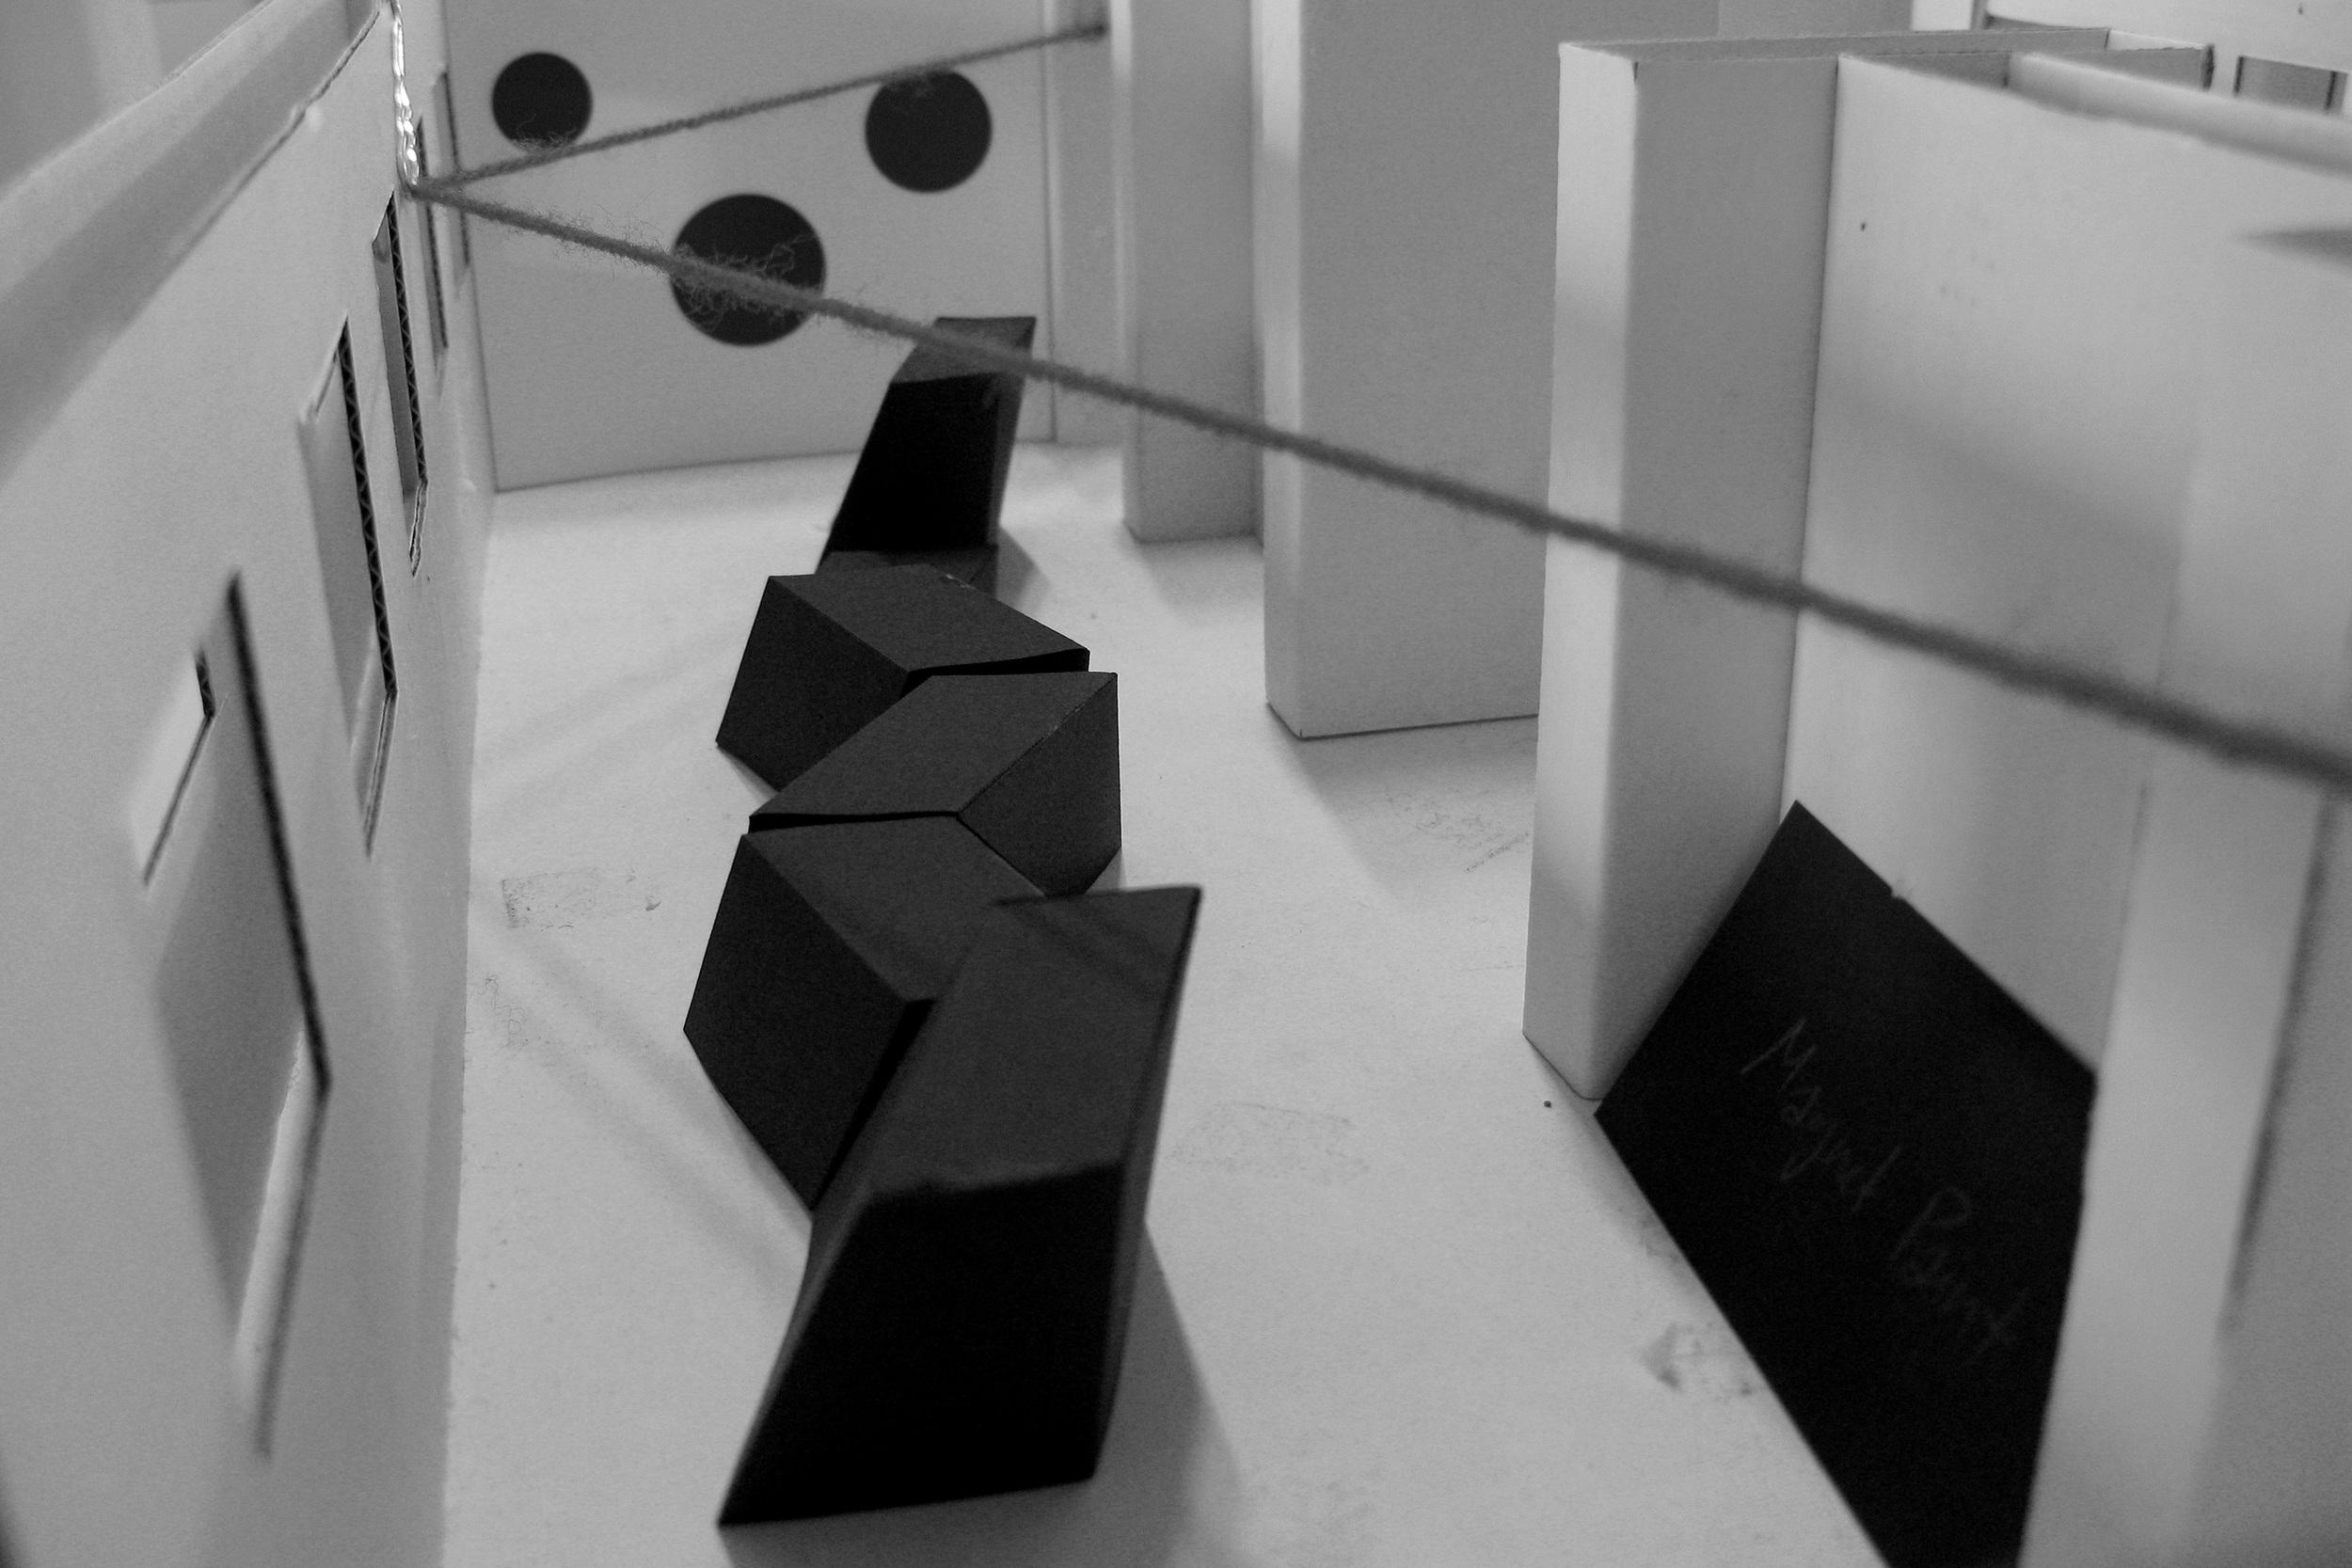 Studio-MoritzPutzier_WWH_StilleStars-09.jpg